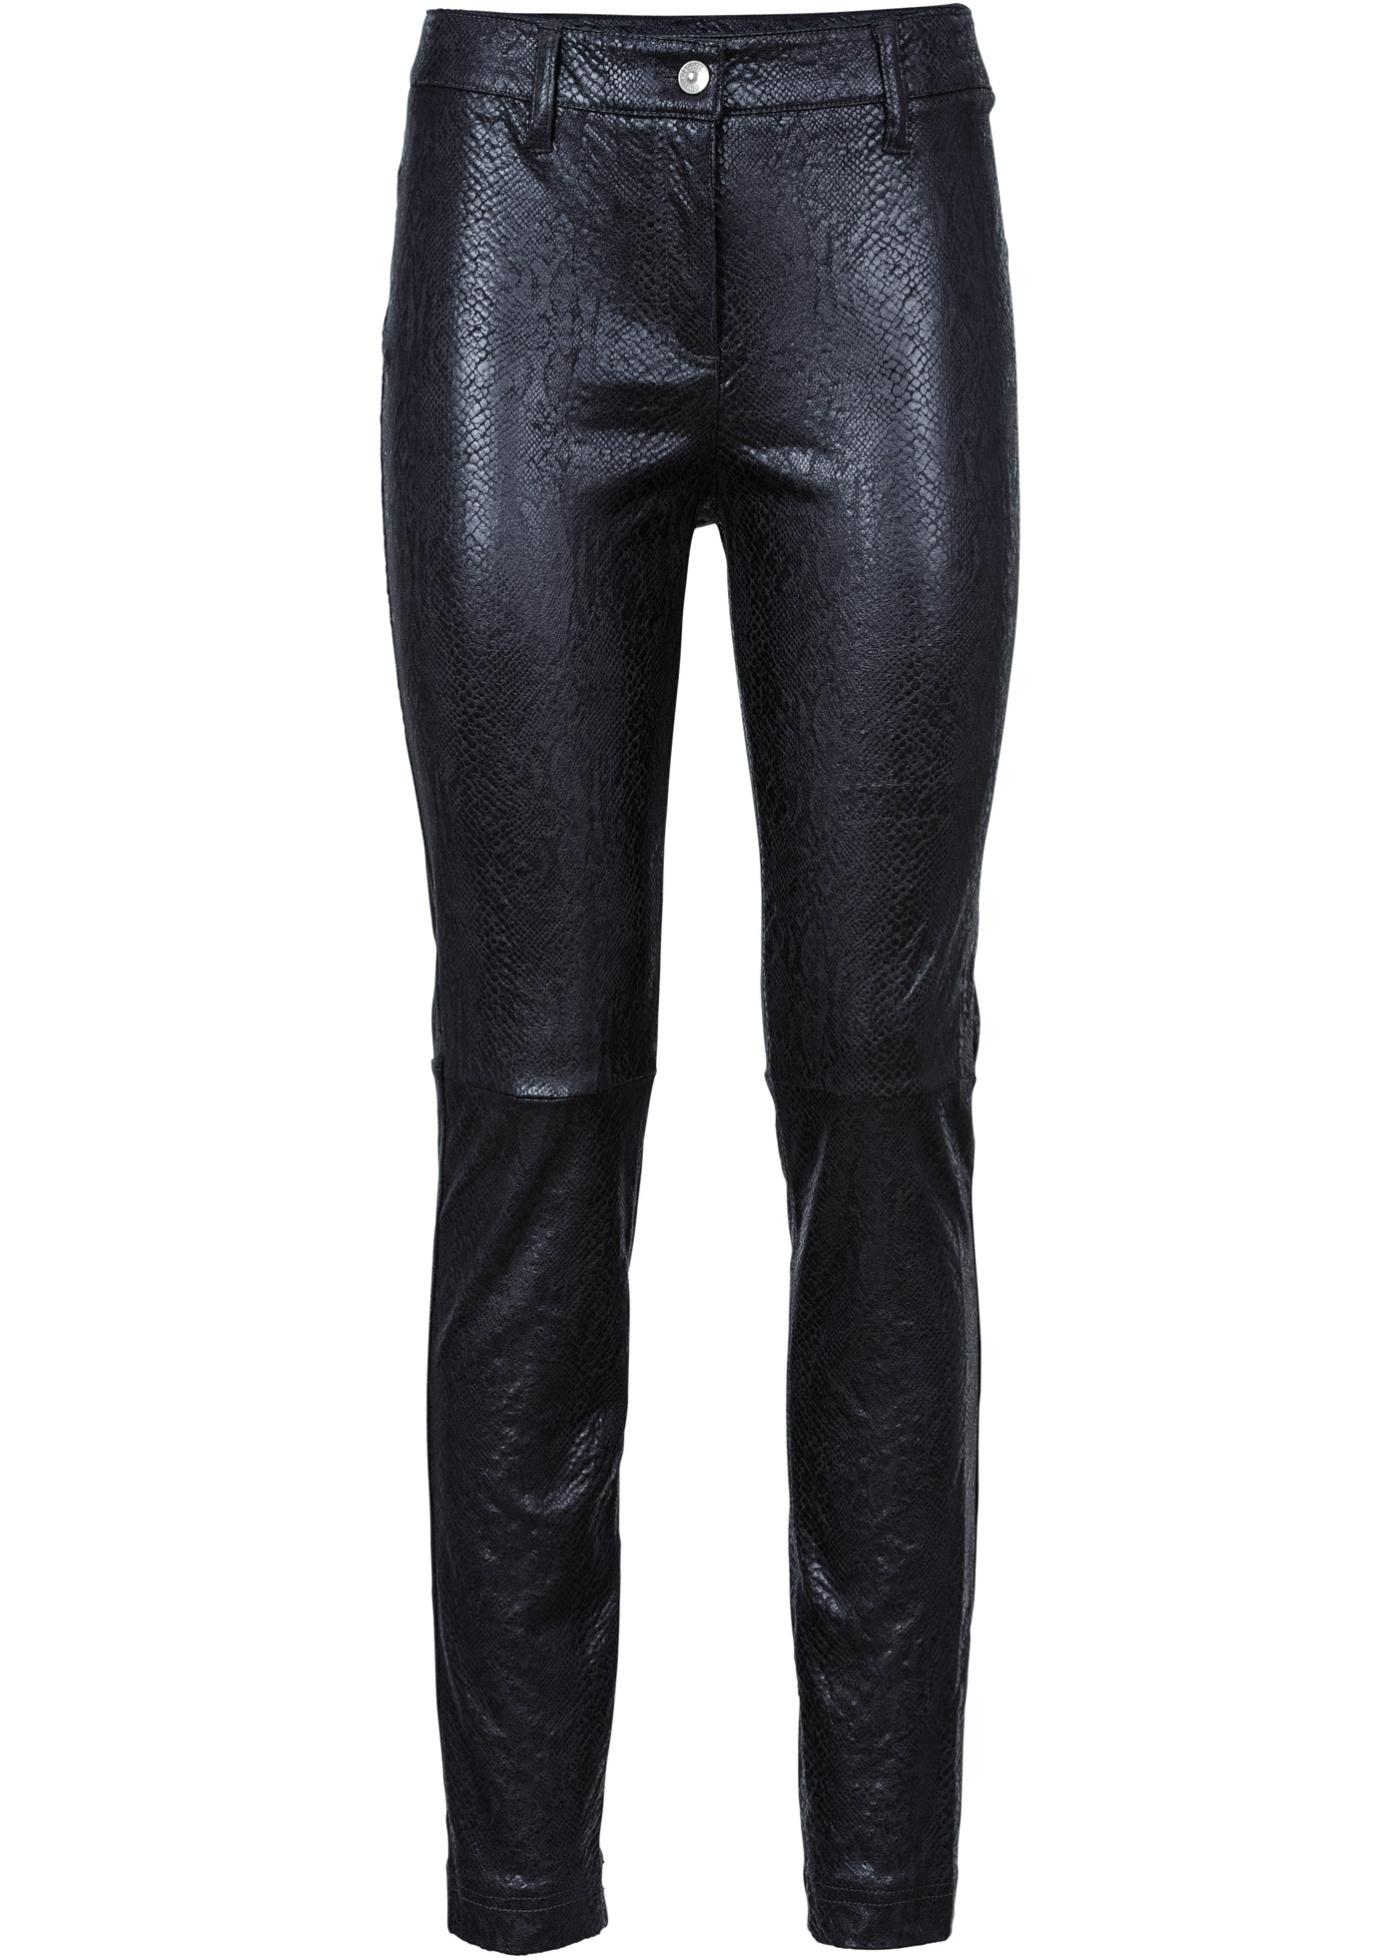 Pantalon synthétique imitation cuir velours...